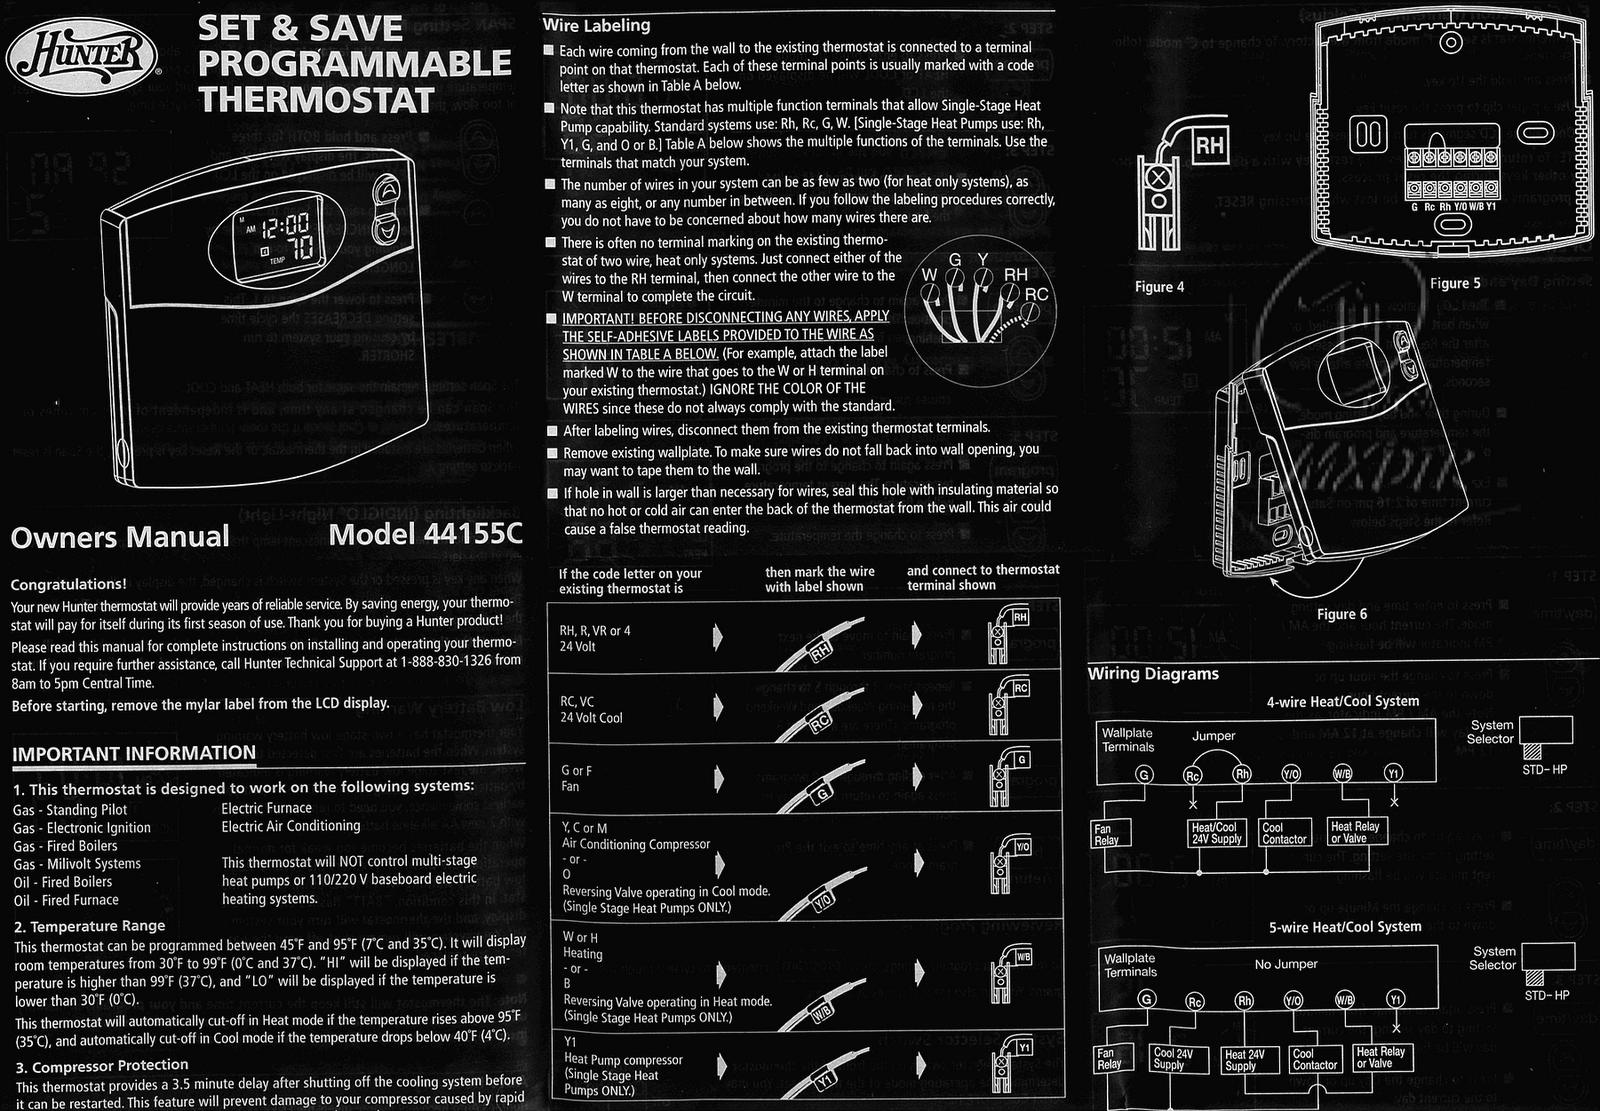 Hunter Thermostat 44155C Manual